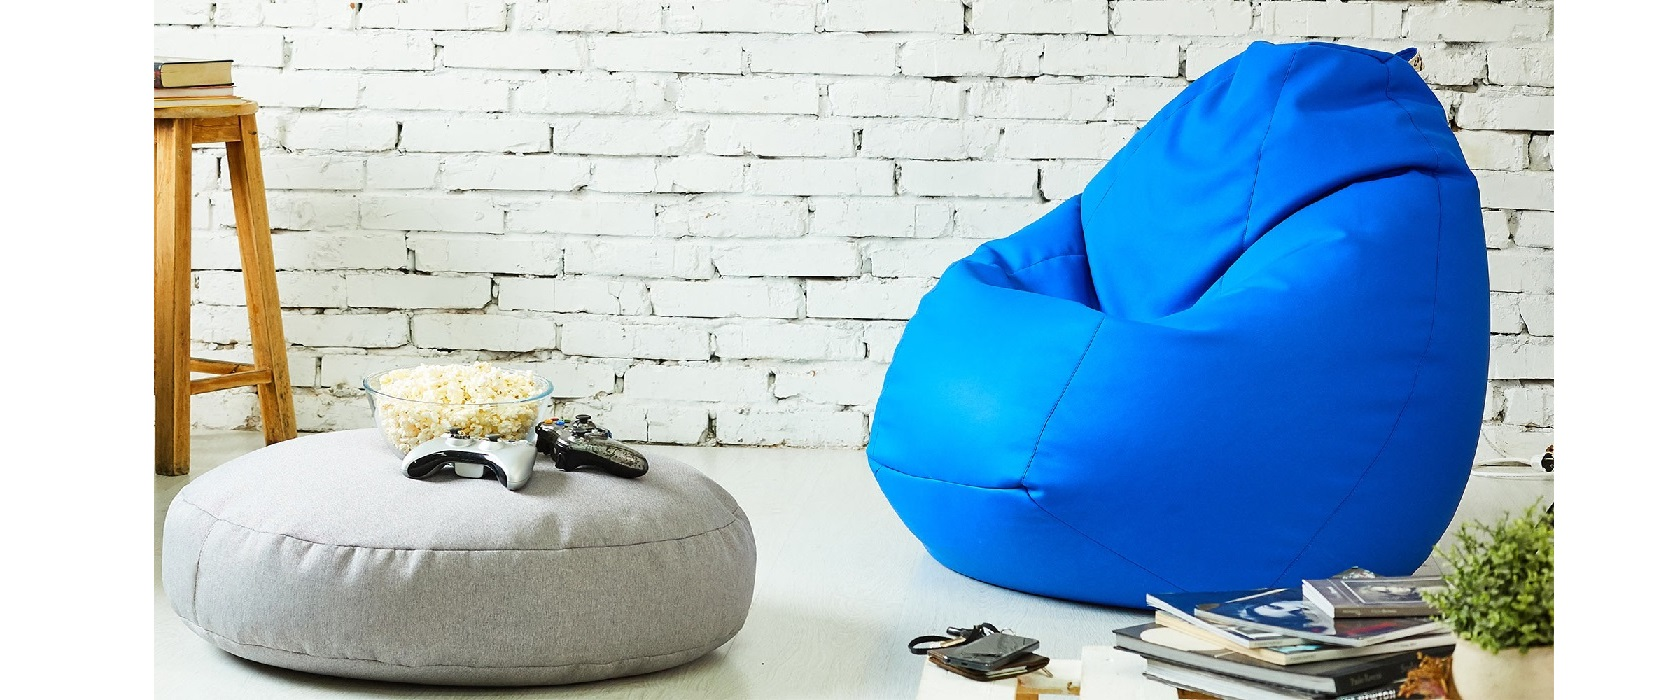 Кресло Pear - Фото 2 - Pufetto